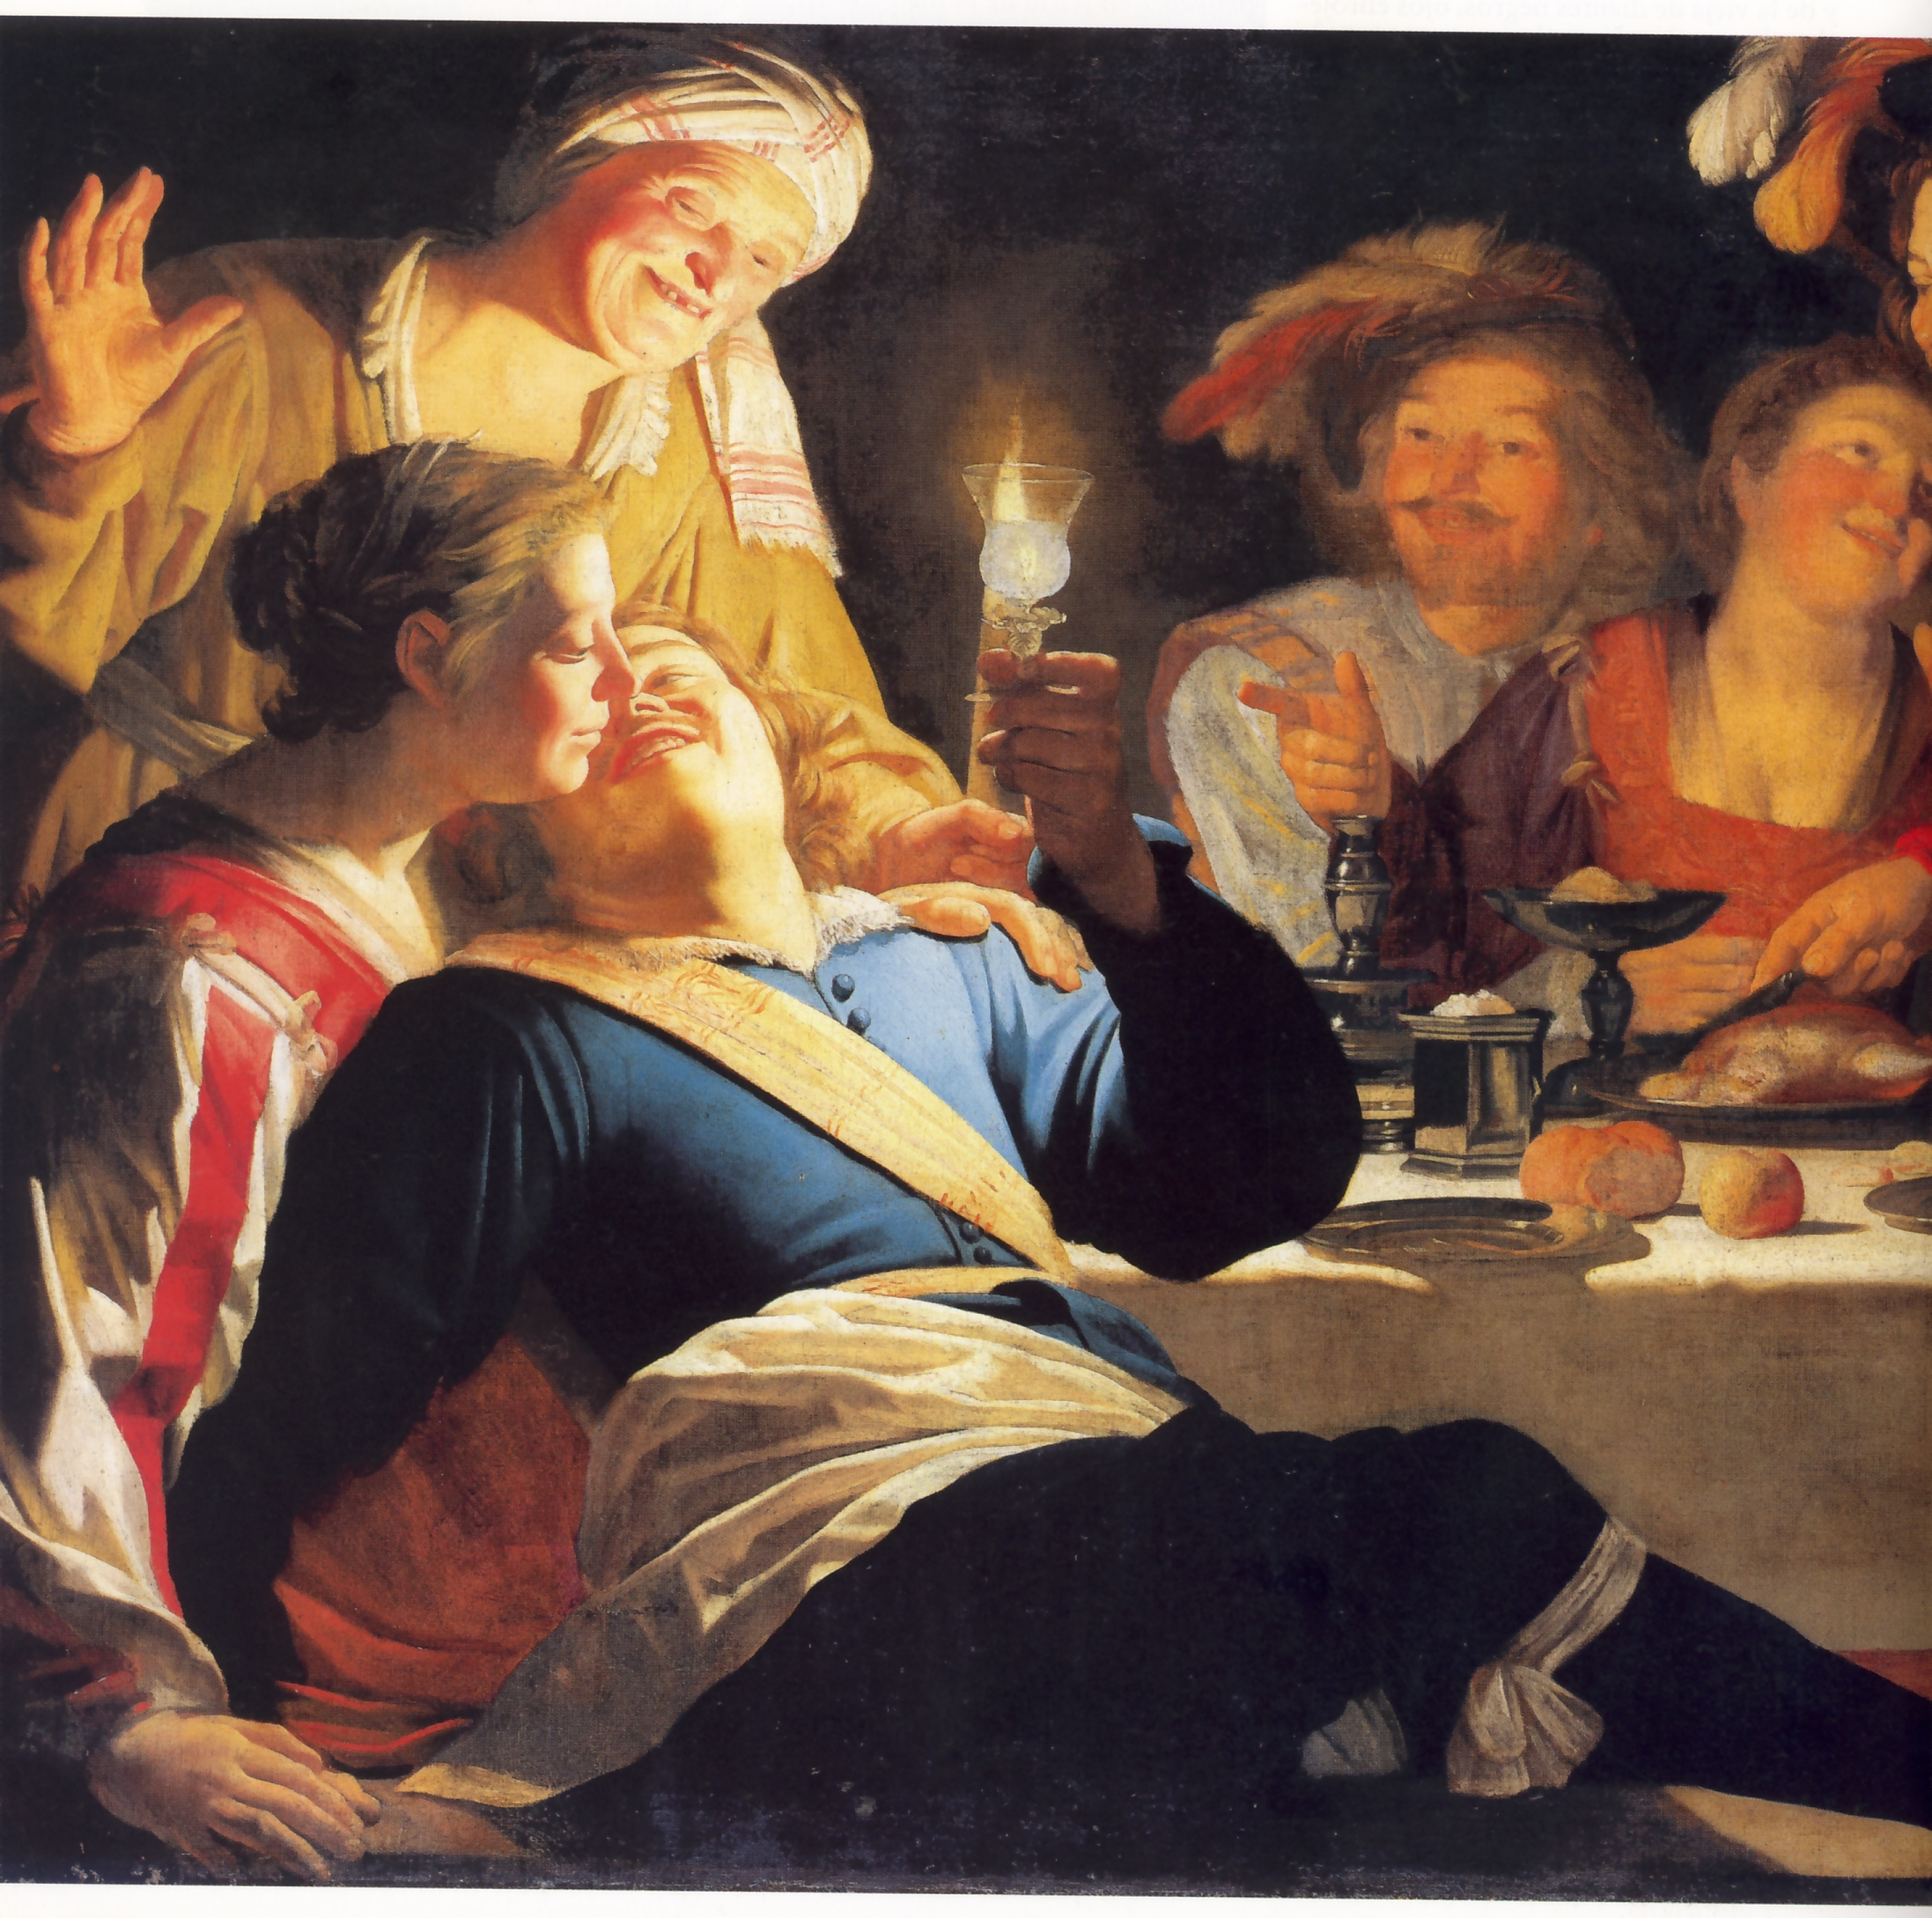 Gerard van Honthorst (1592- 1656), Il figliol prodigo